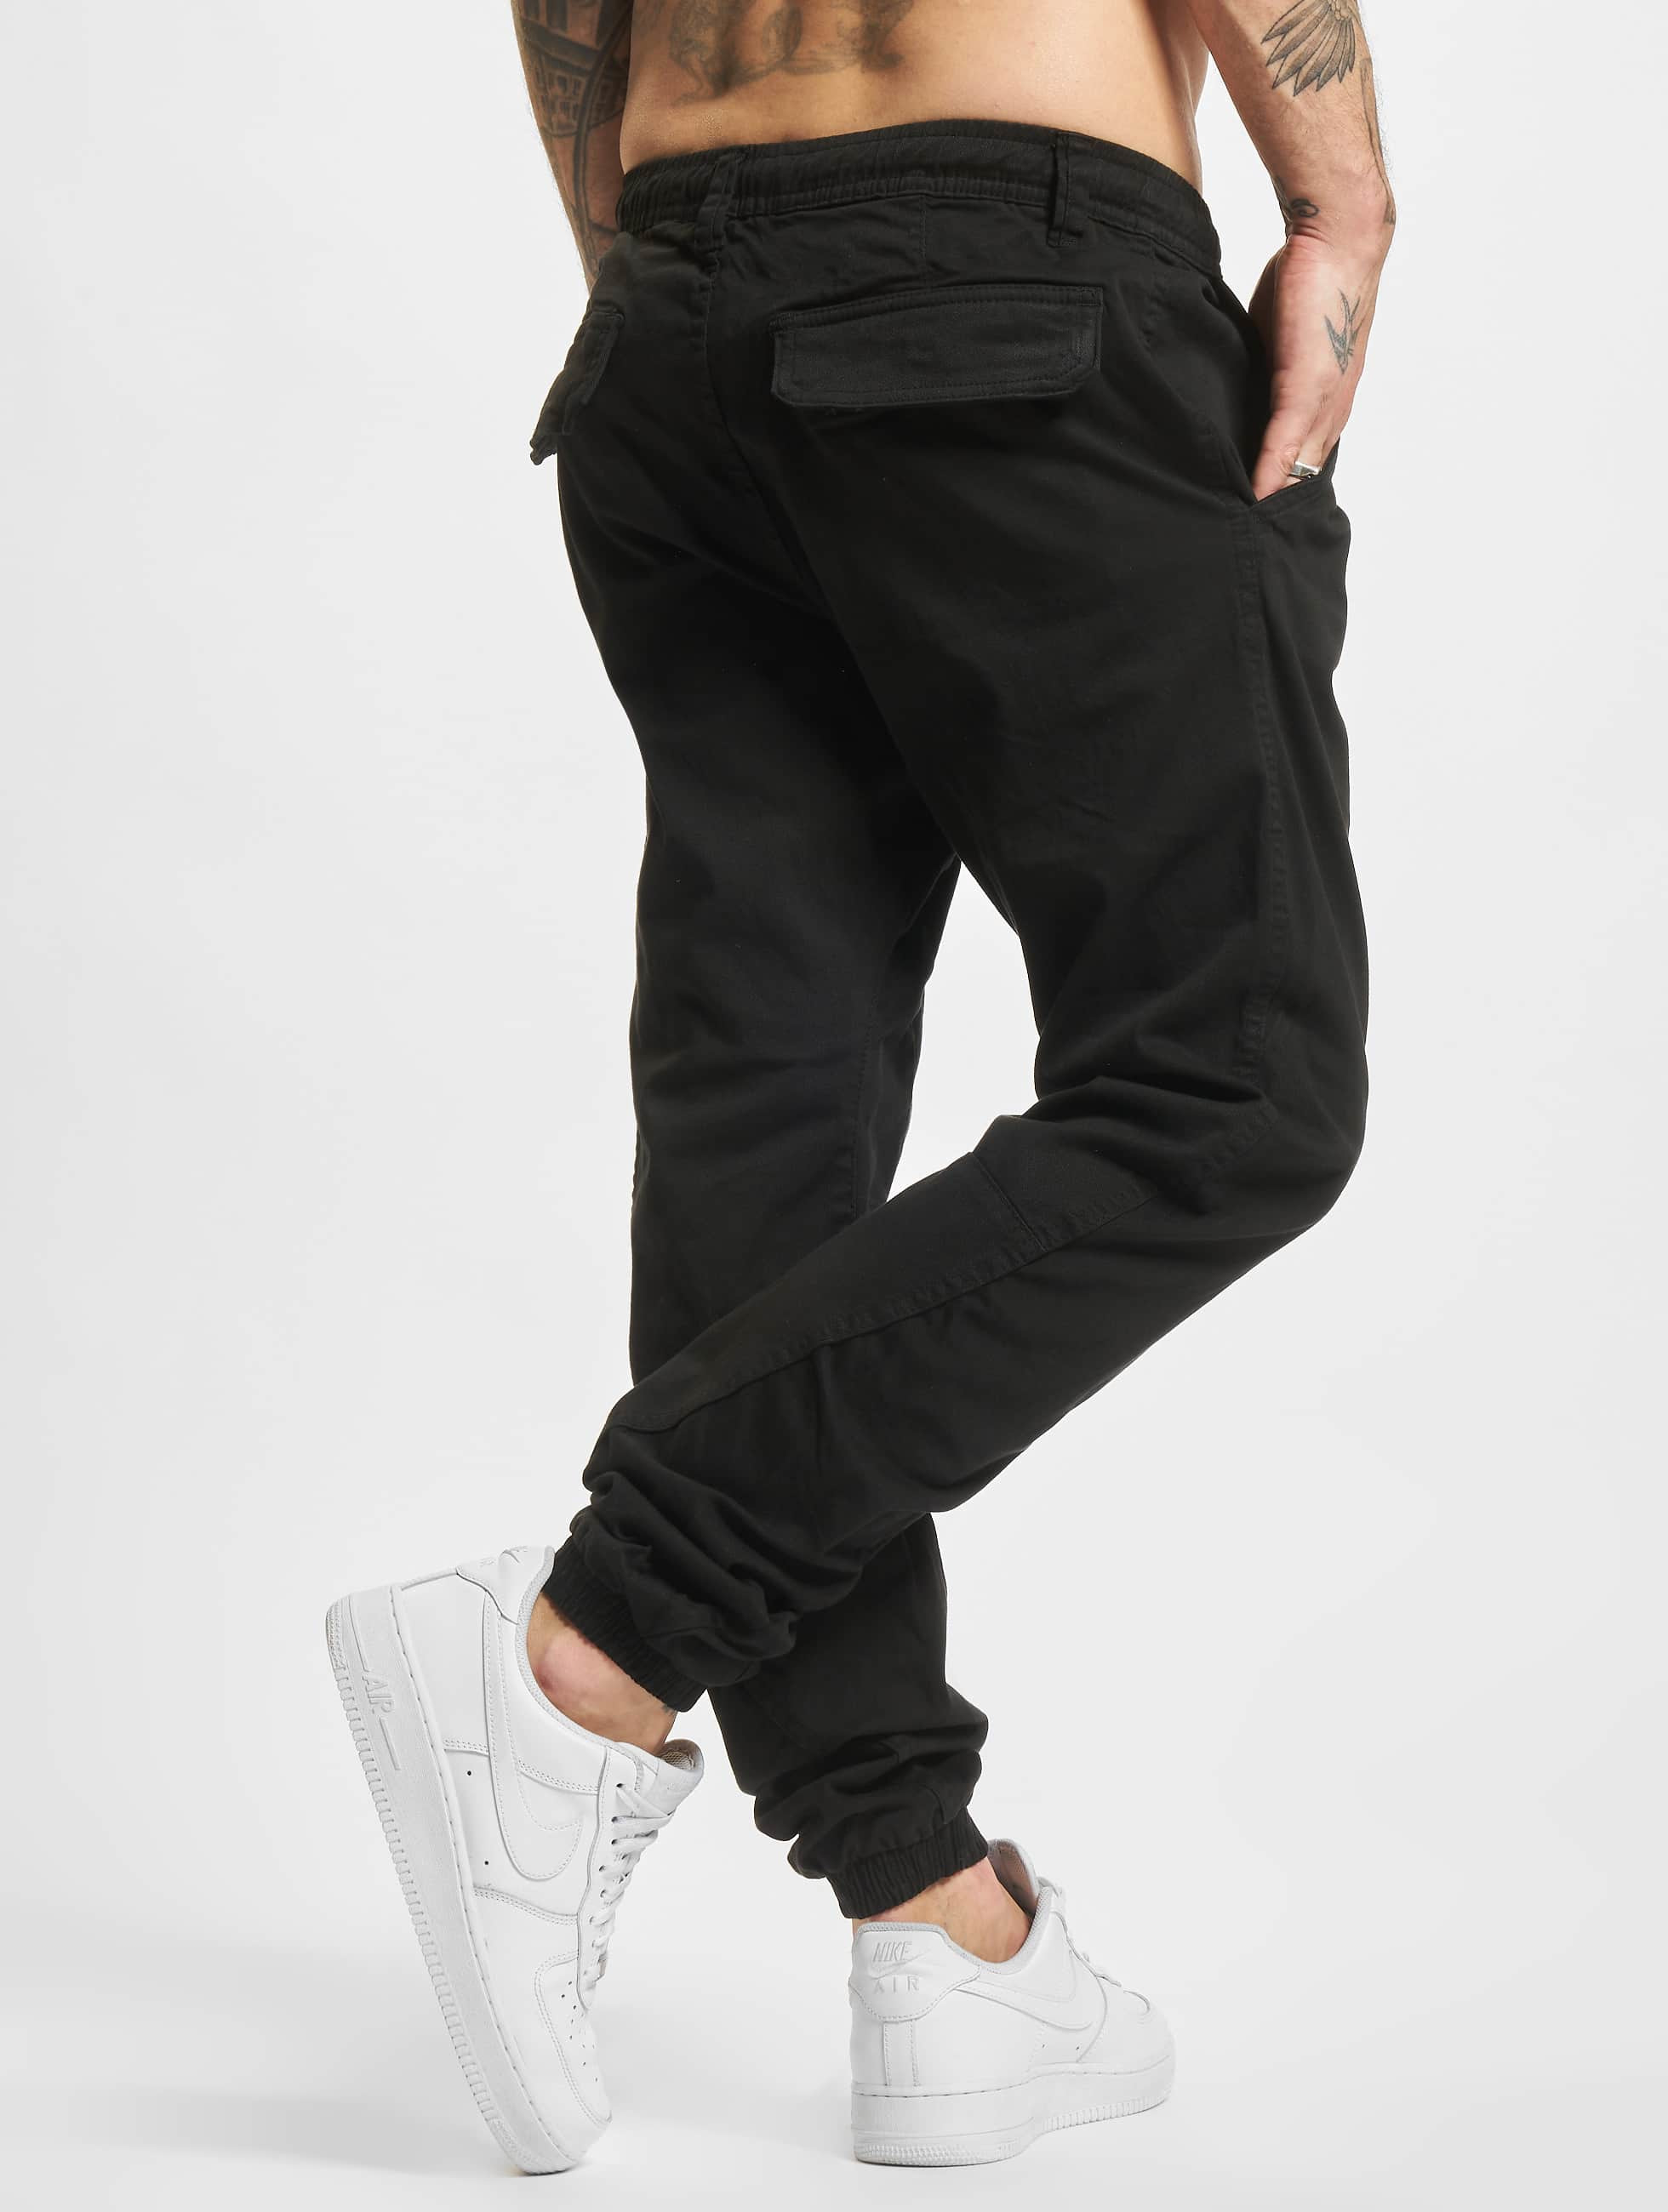 Urban Classics Jogginghose Stretch schwarz